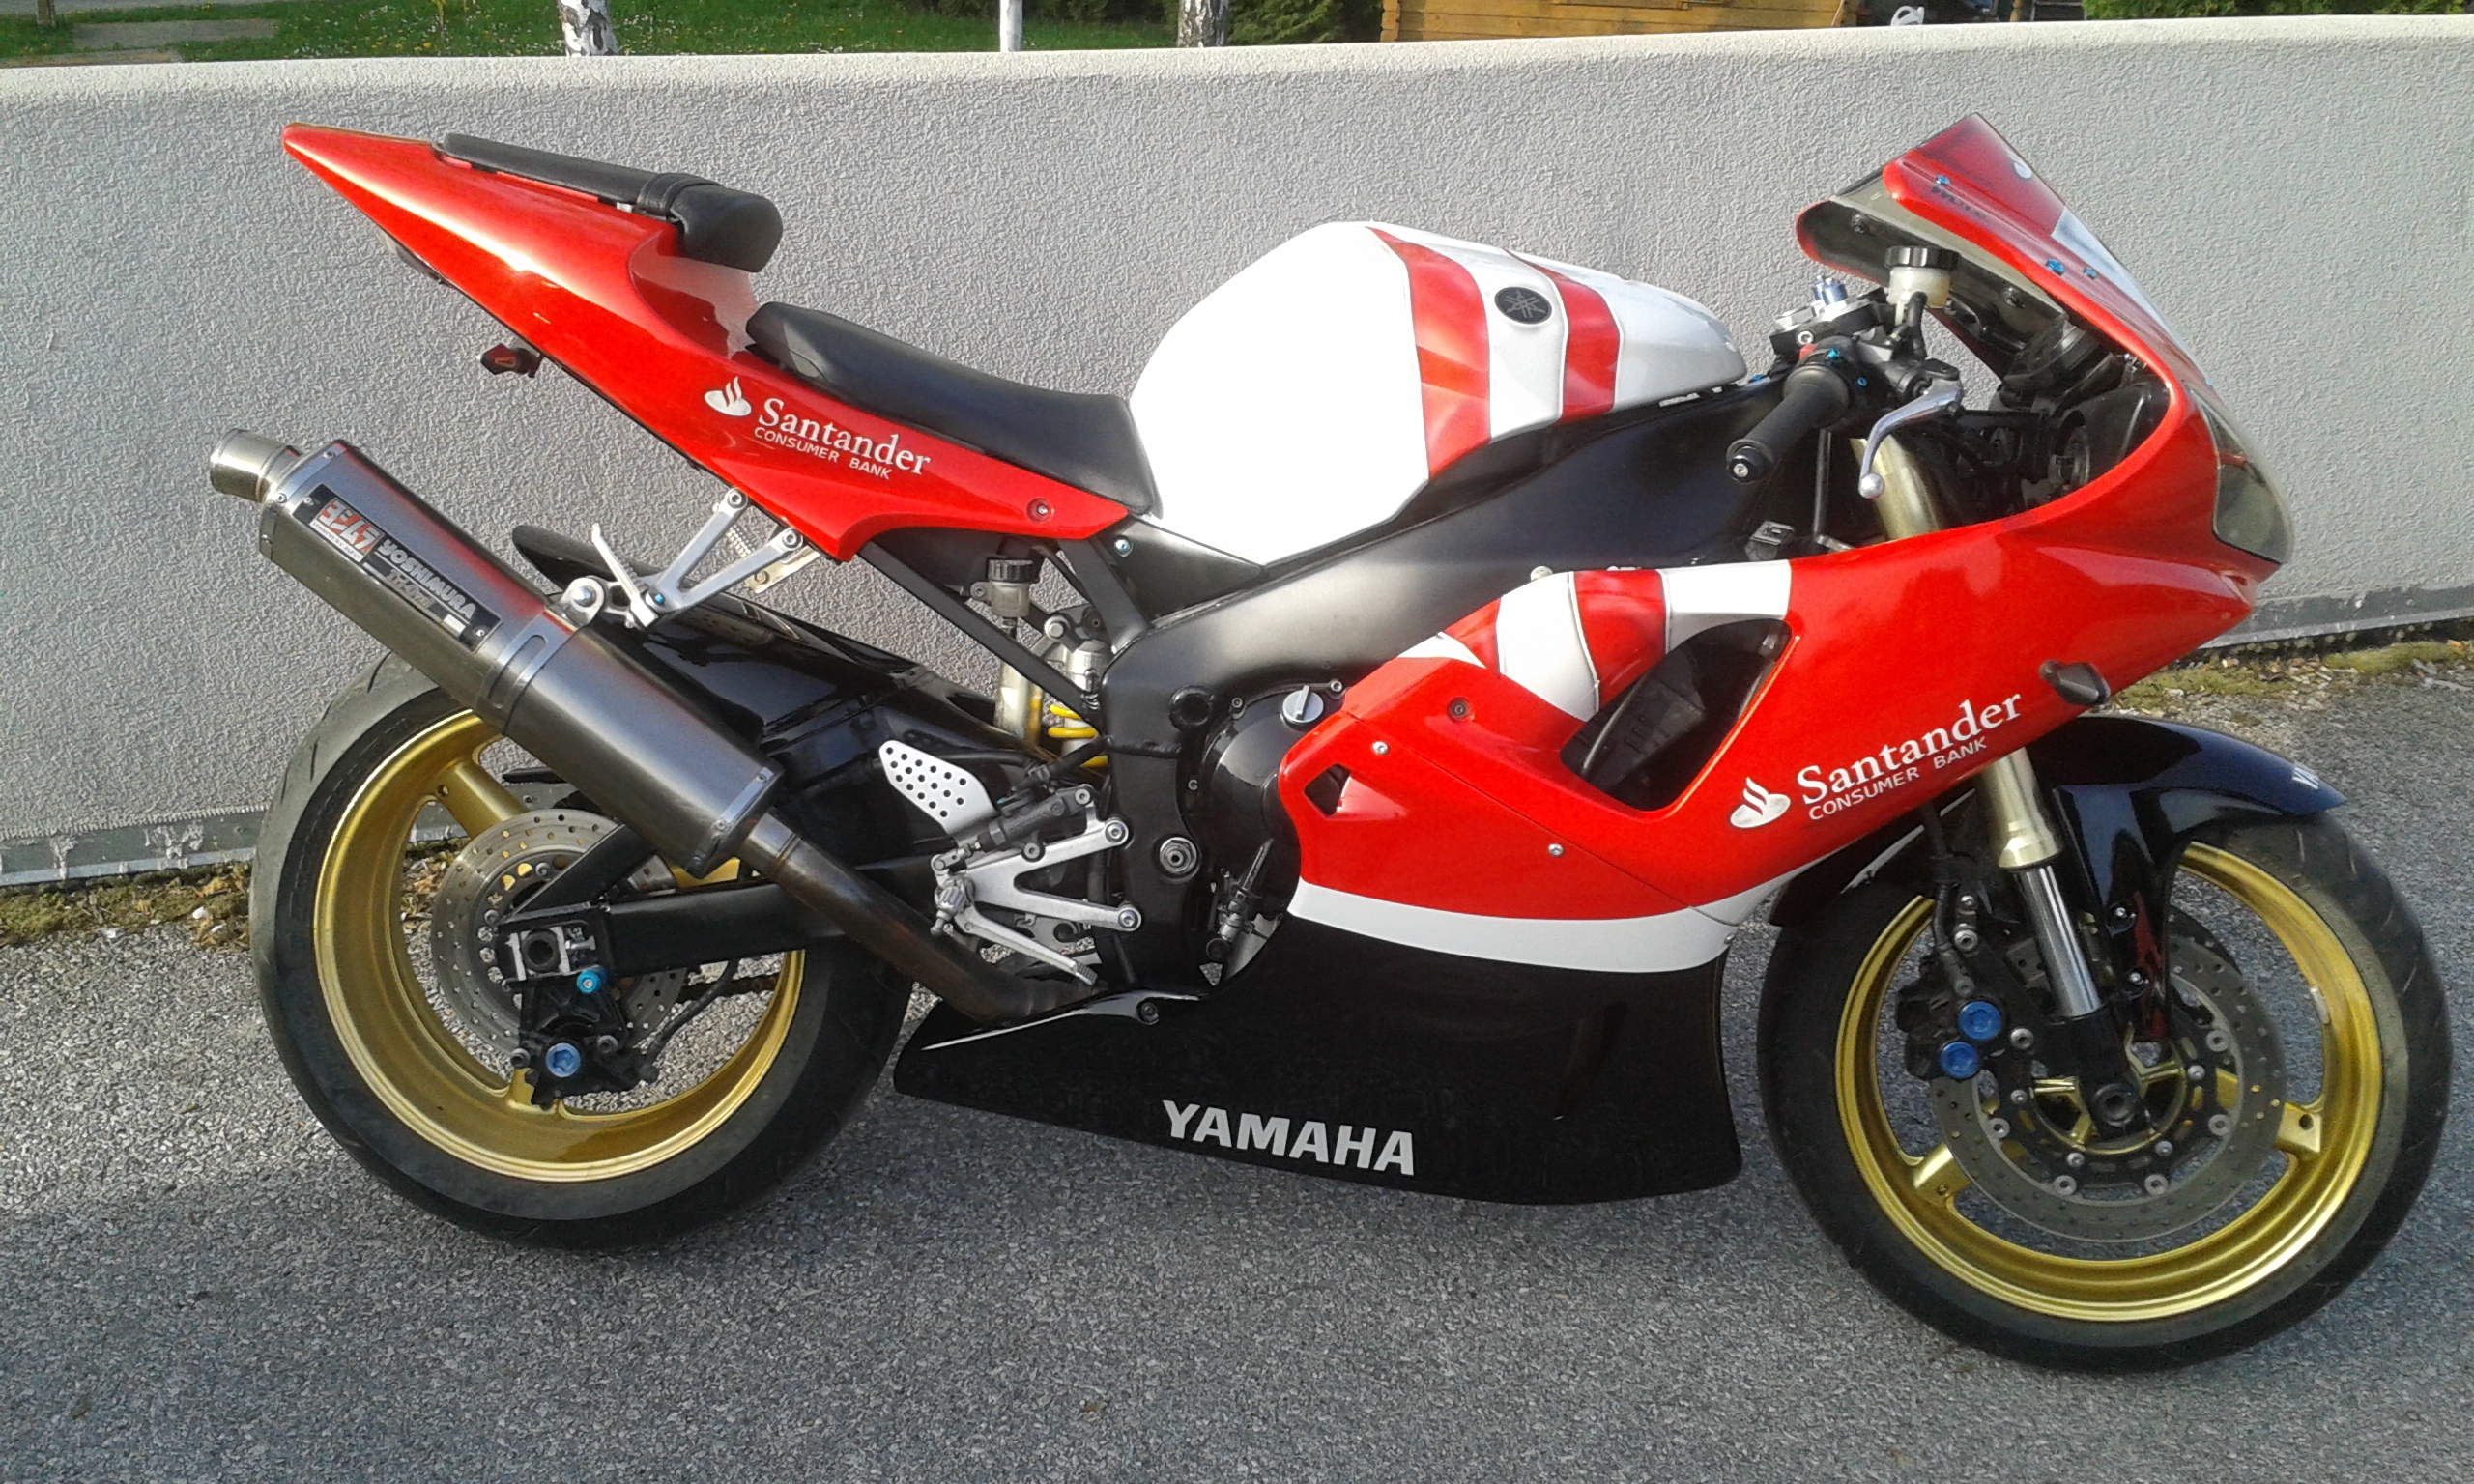 Yamaha Santander